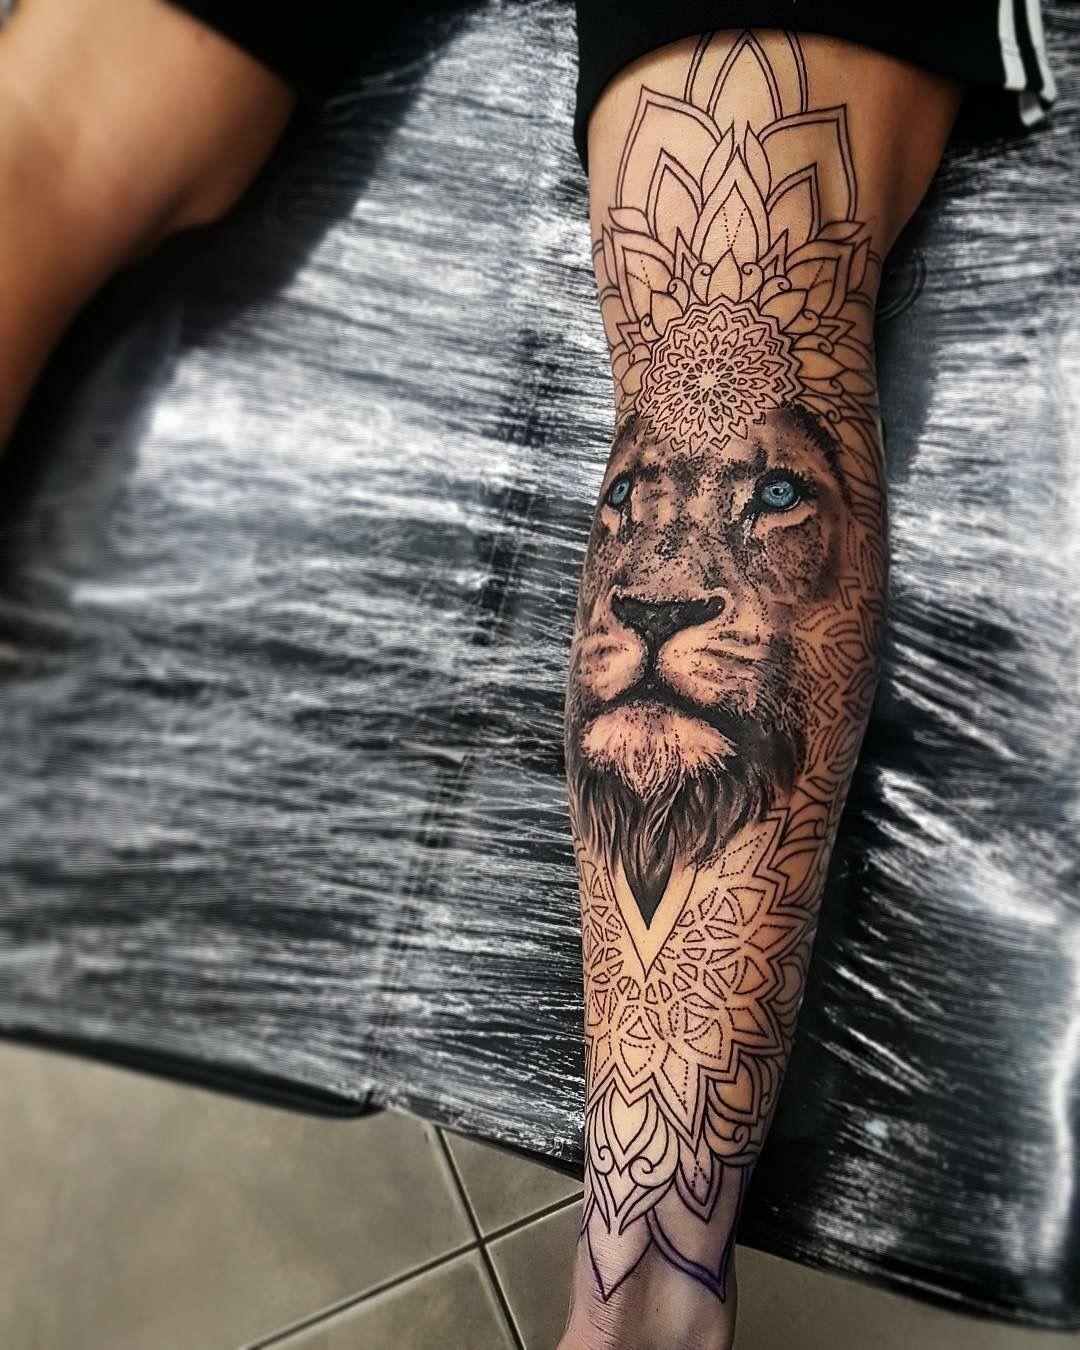 Bezaubernd Schöne Tattoos Für Männer Das Beste Von #tattoo #tattooart #art #lion #mandalas #mandalatattoo #inspiration